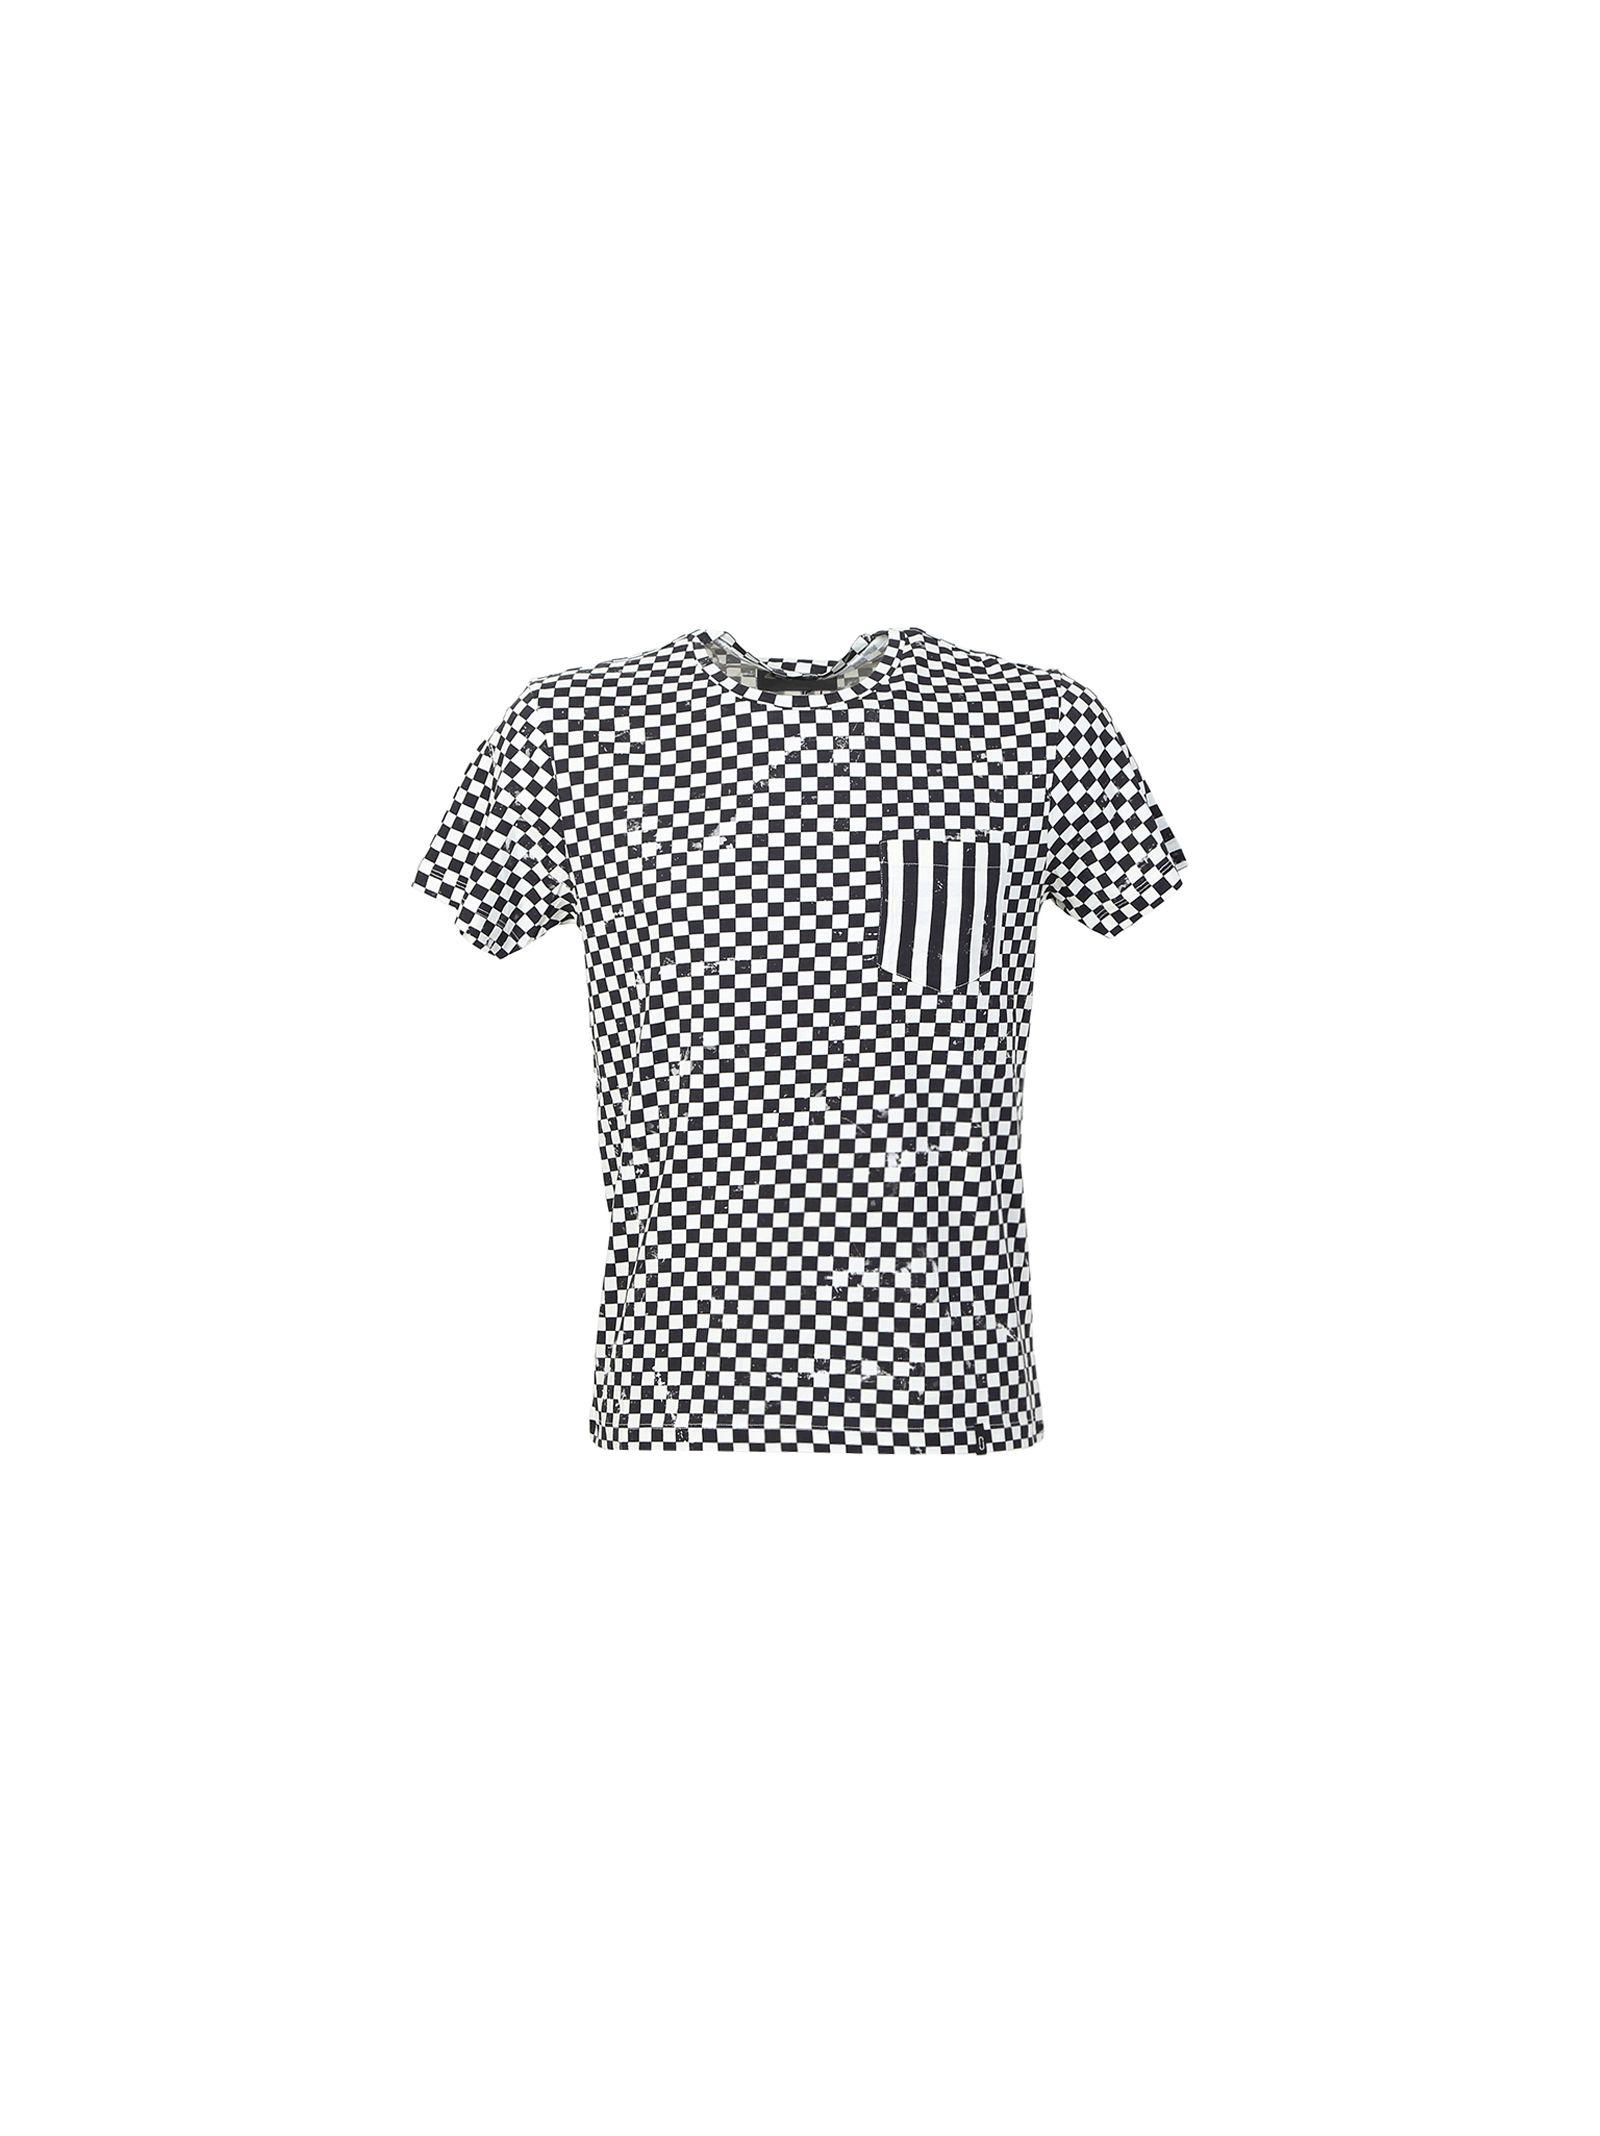 marc jacobs male chessboard cotton tshirt